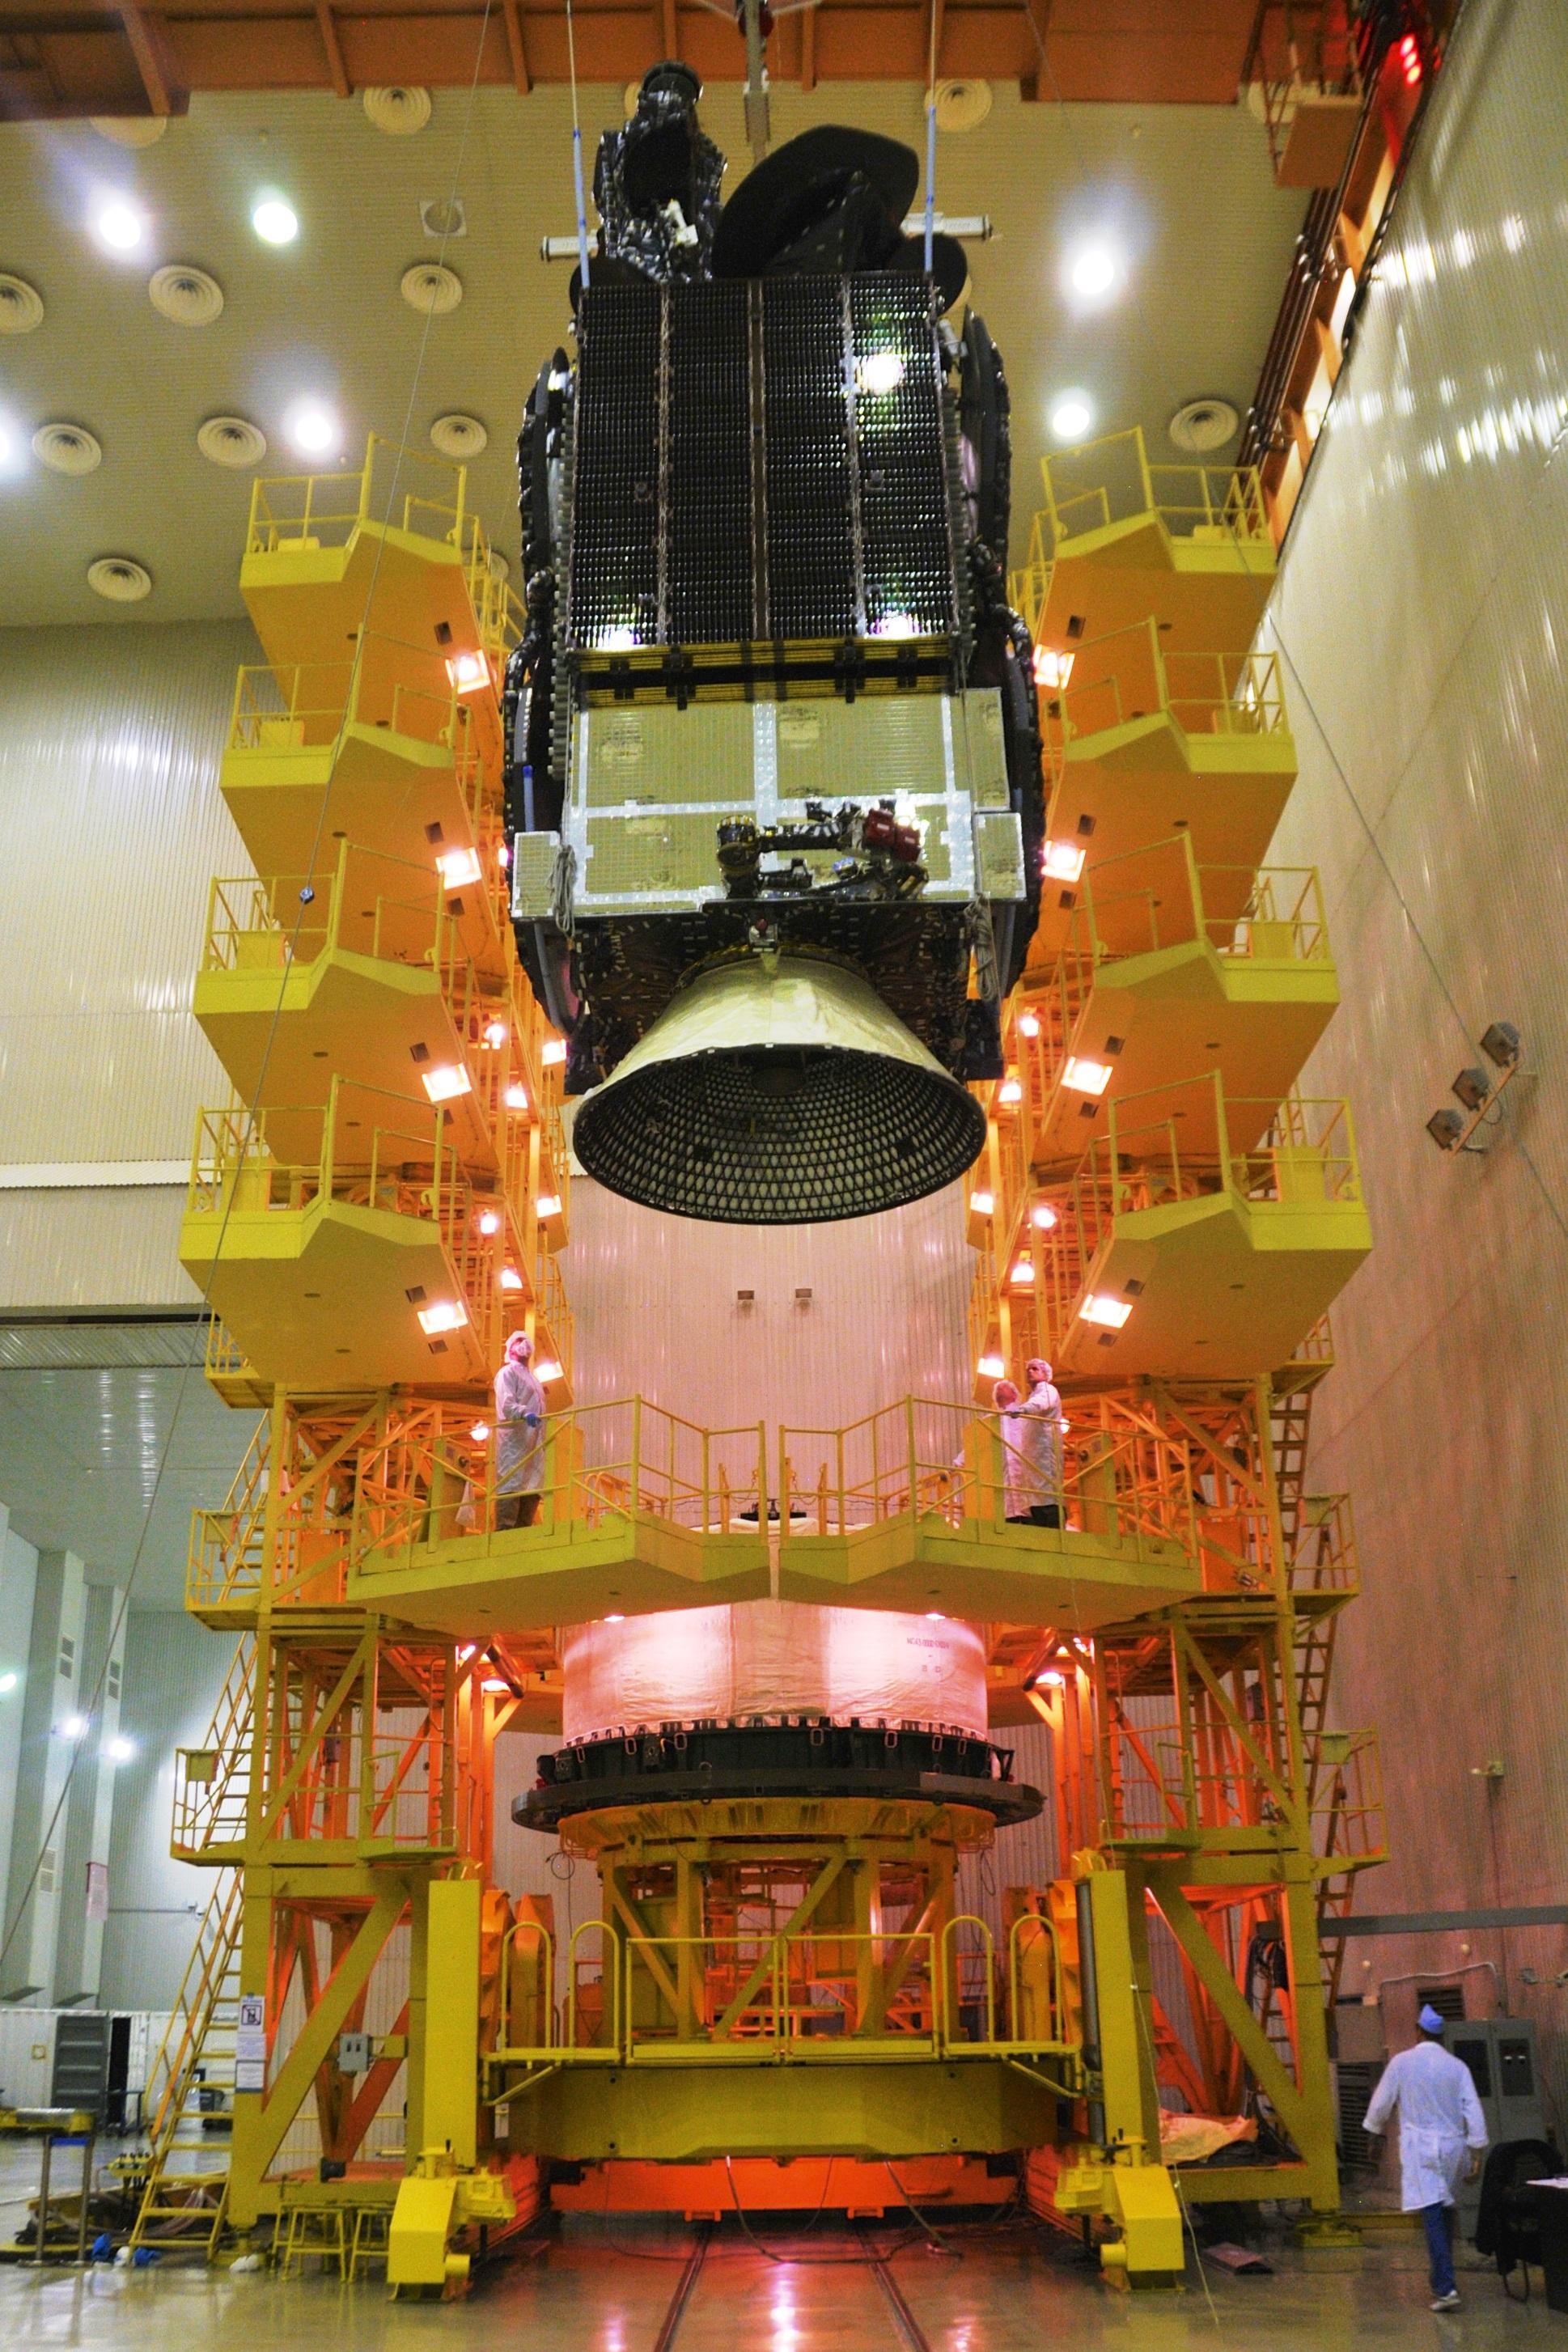 Lancement Proton-M / Intelsat-31 - 9 juin 2016 ISDLA-2-27-May-33